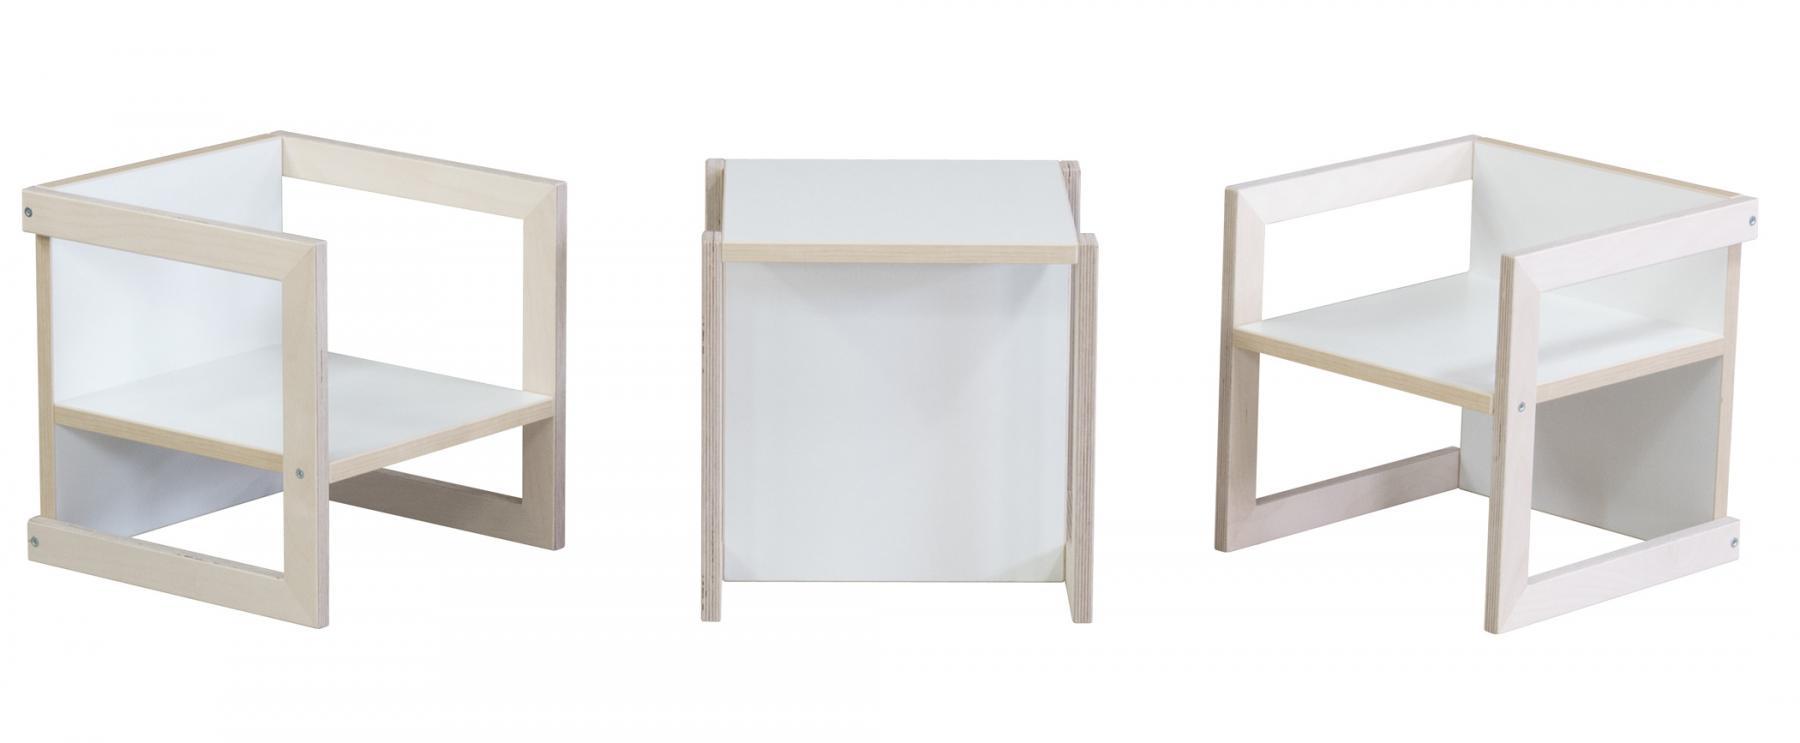 kindersitzgruppe kinderm bel stuhl michel 3 teilig birke wei in 3 sitzh hen kaufen bei pihami. Black Bedroom Furniture Sets. Home Design Ideas